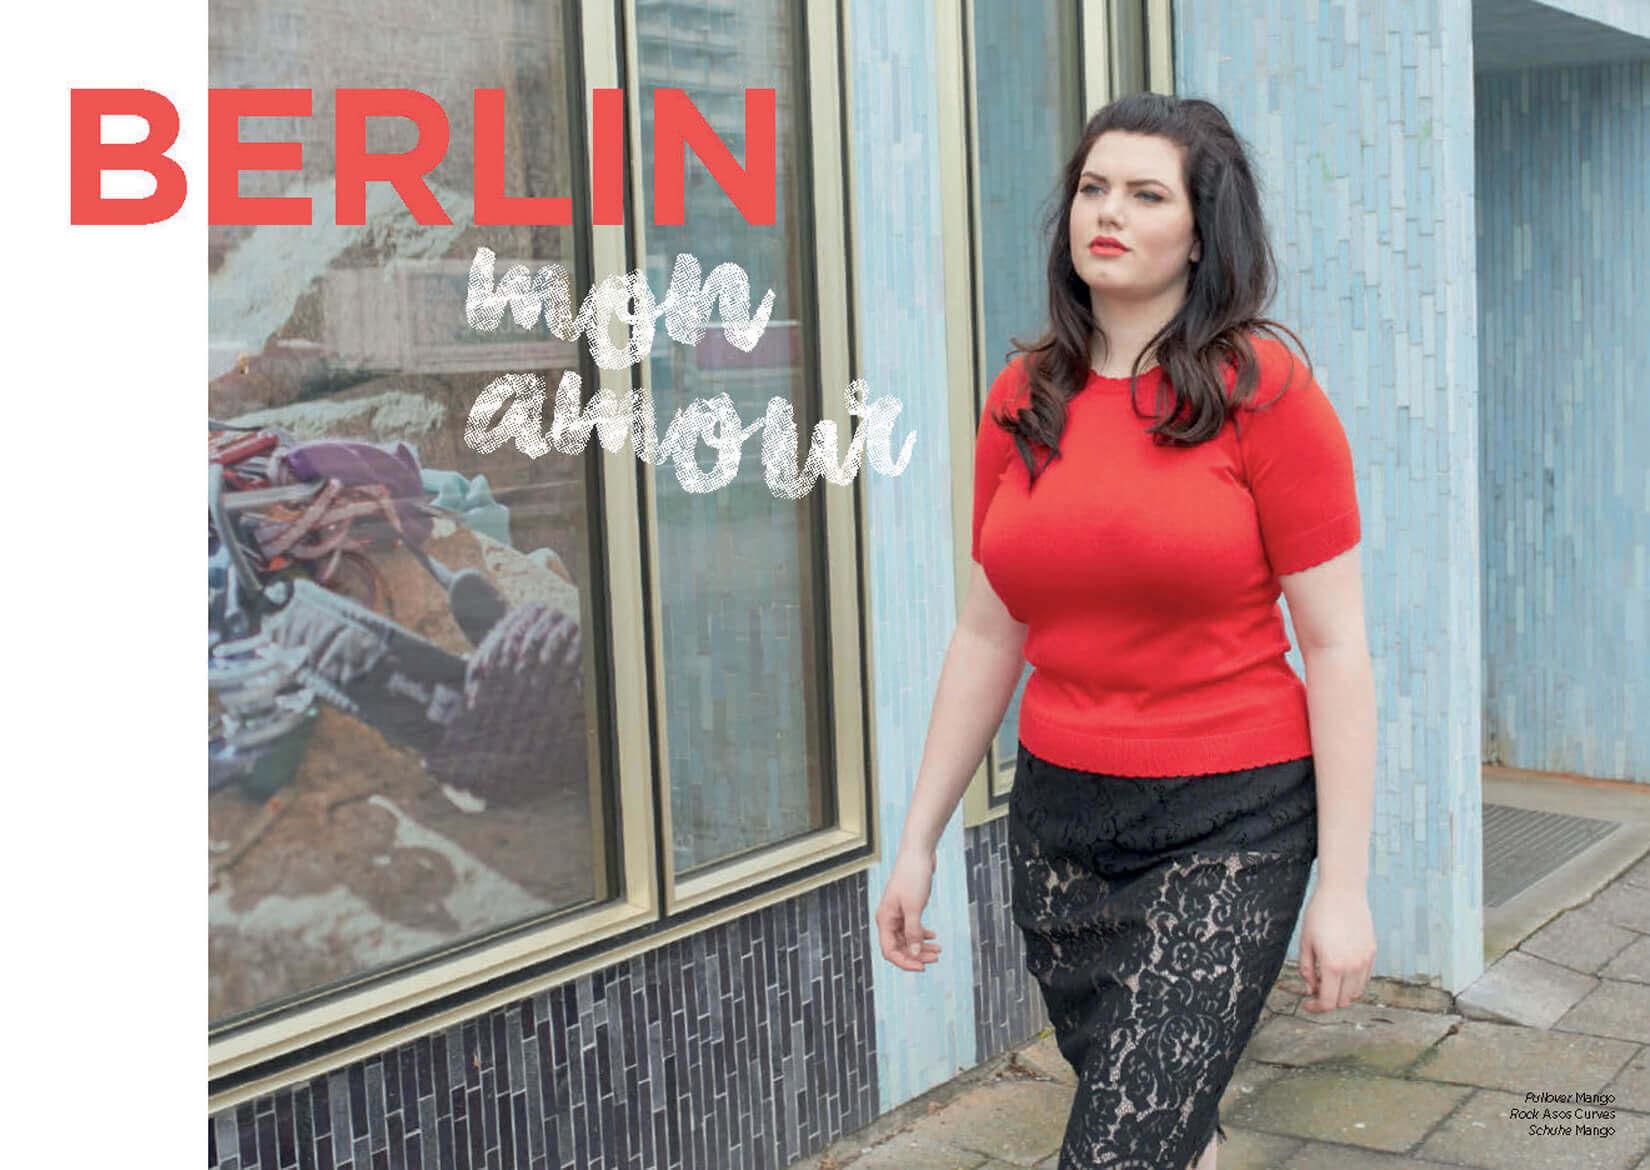 Berlin dating seiten